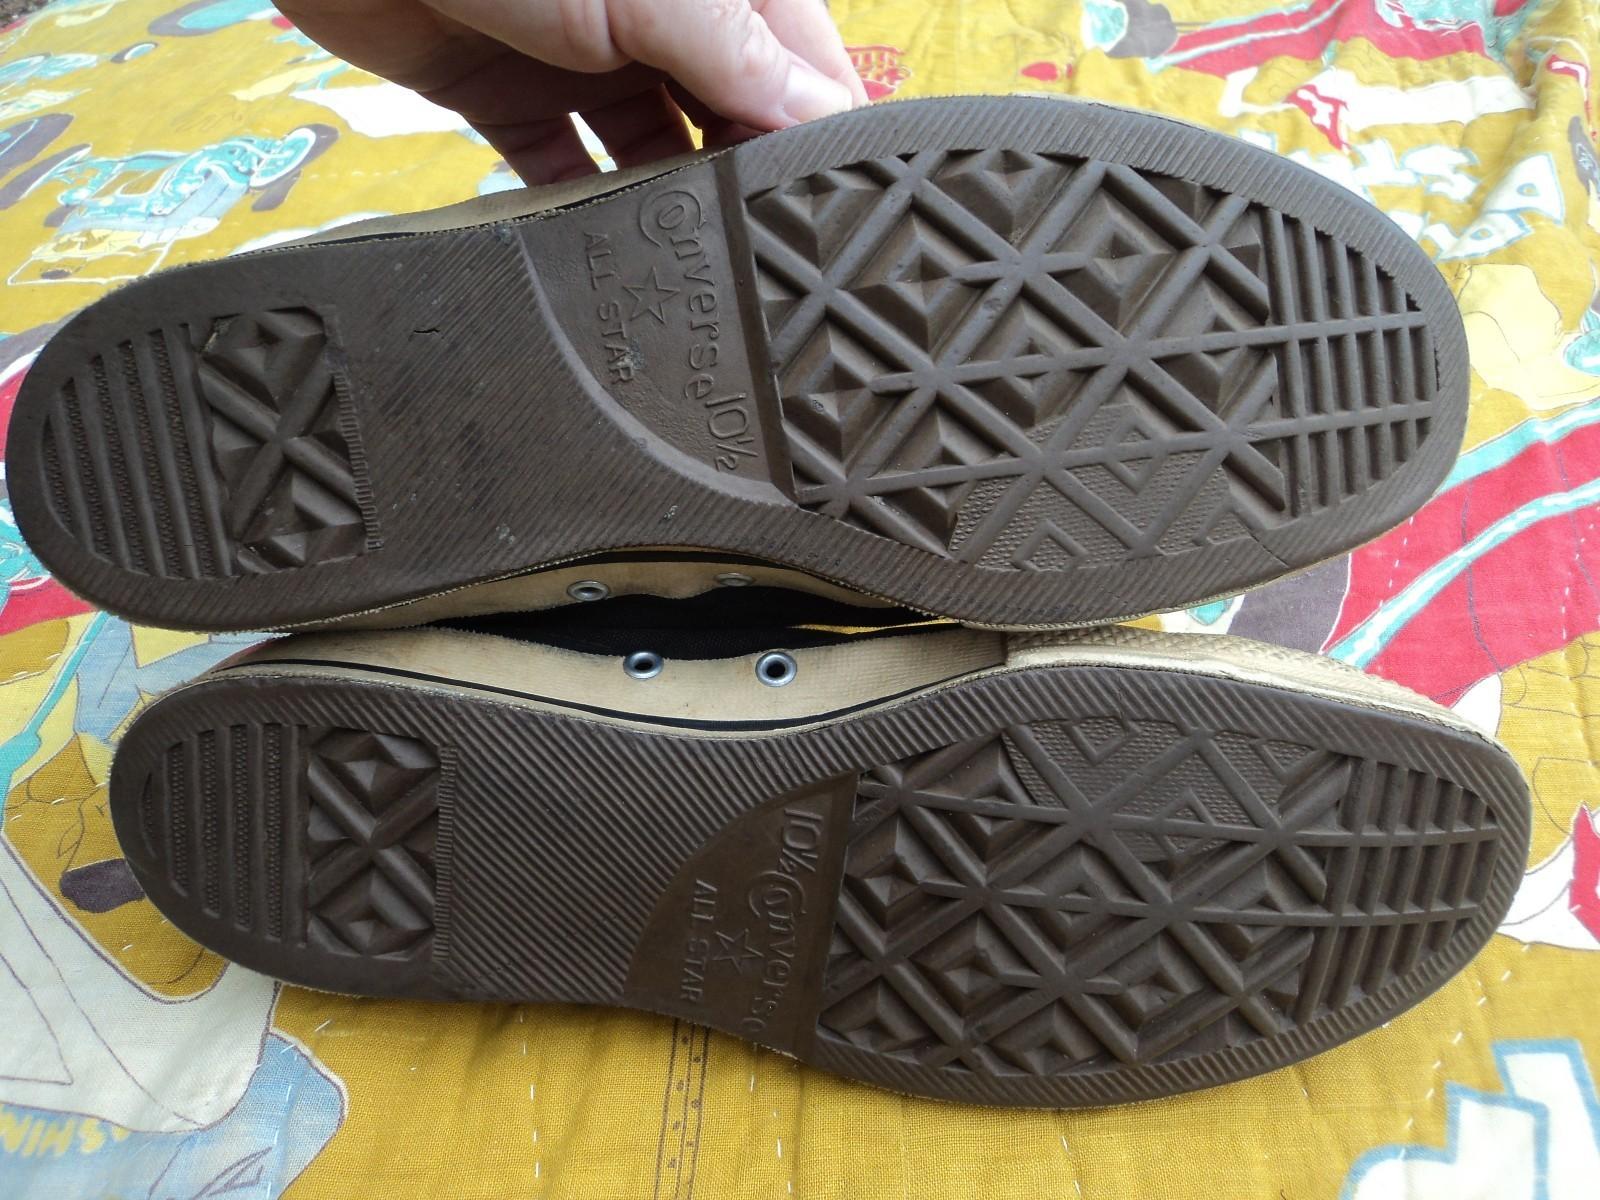 Converse clipart sole shoe Blakplague rubber into soles are